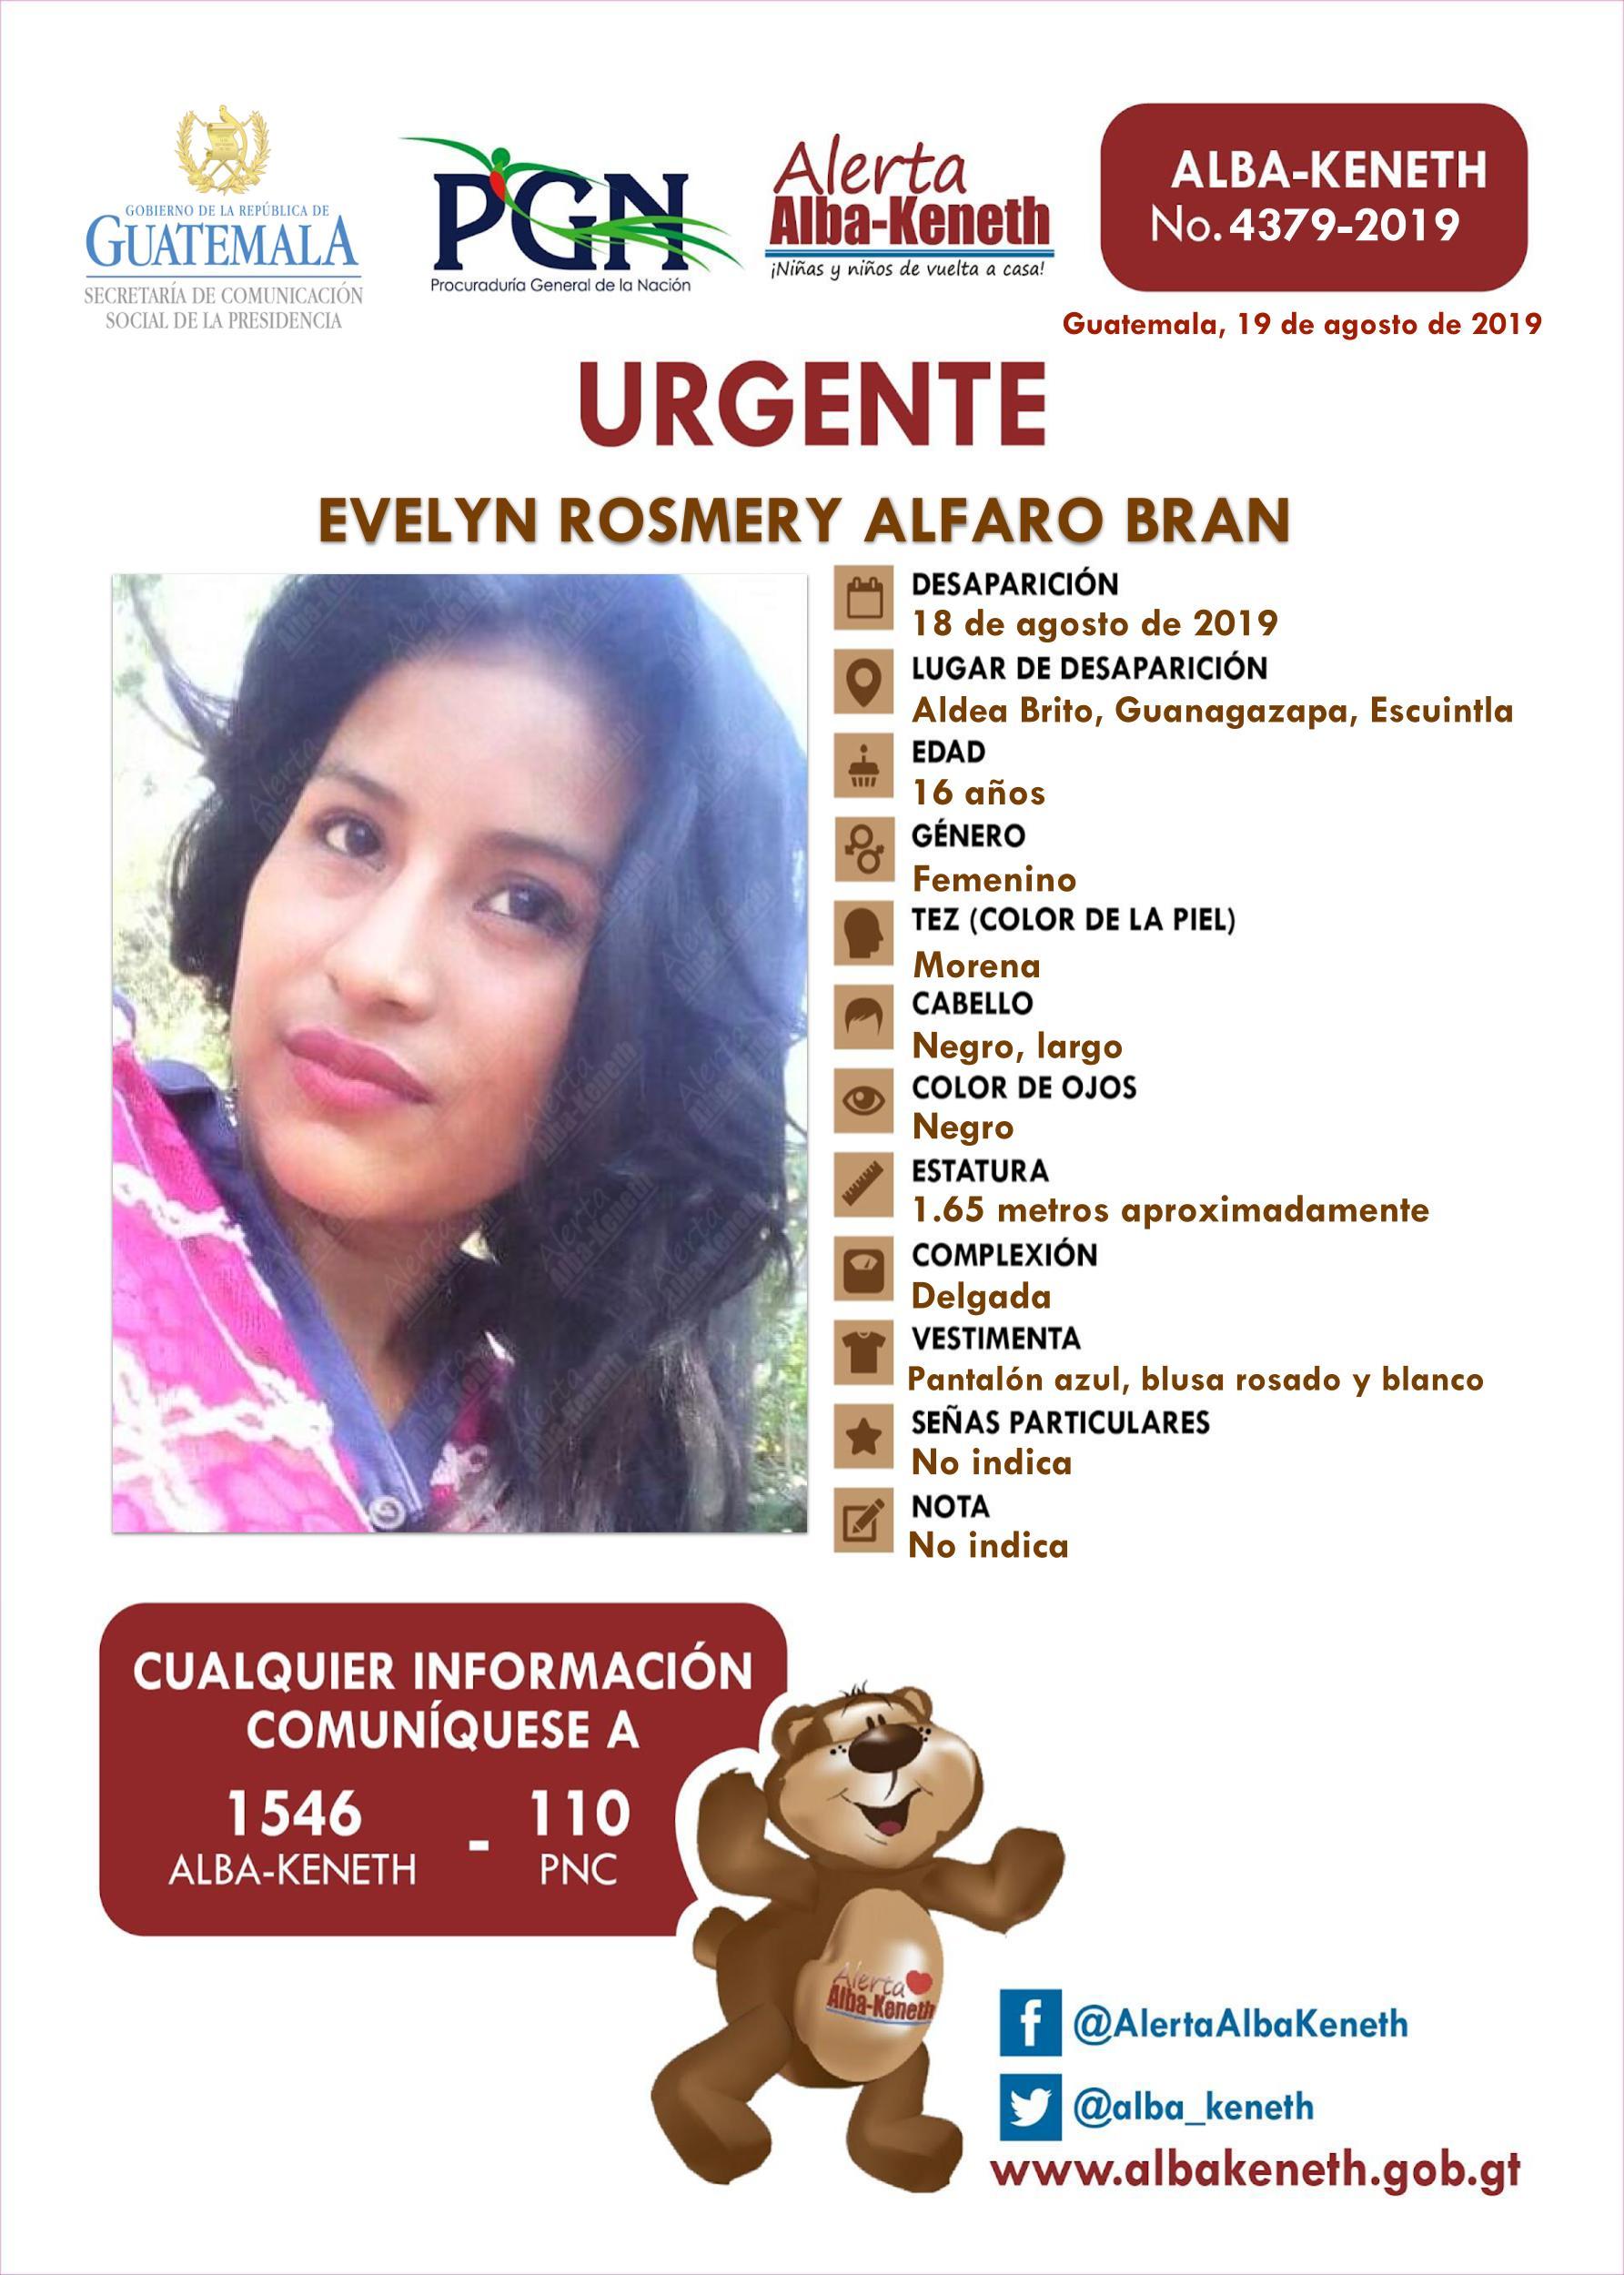 Evelyn Rosmery Alfaro Bran